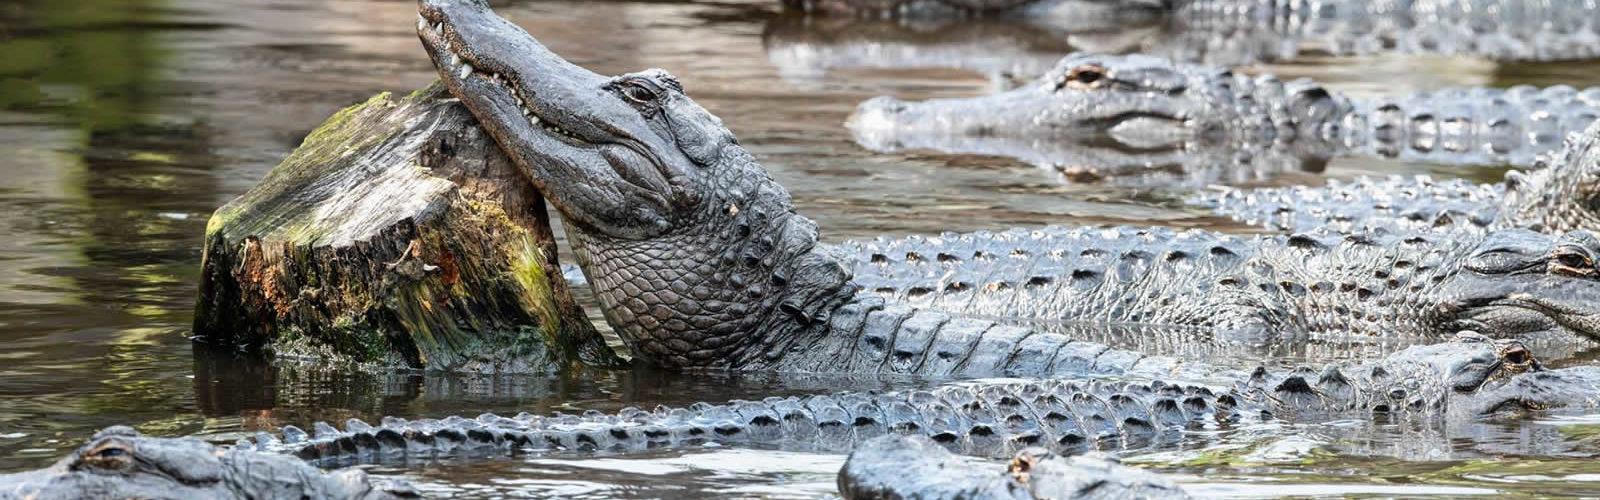 alligator-farm-saint-augustine-une